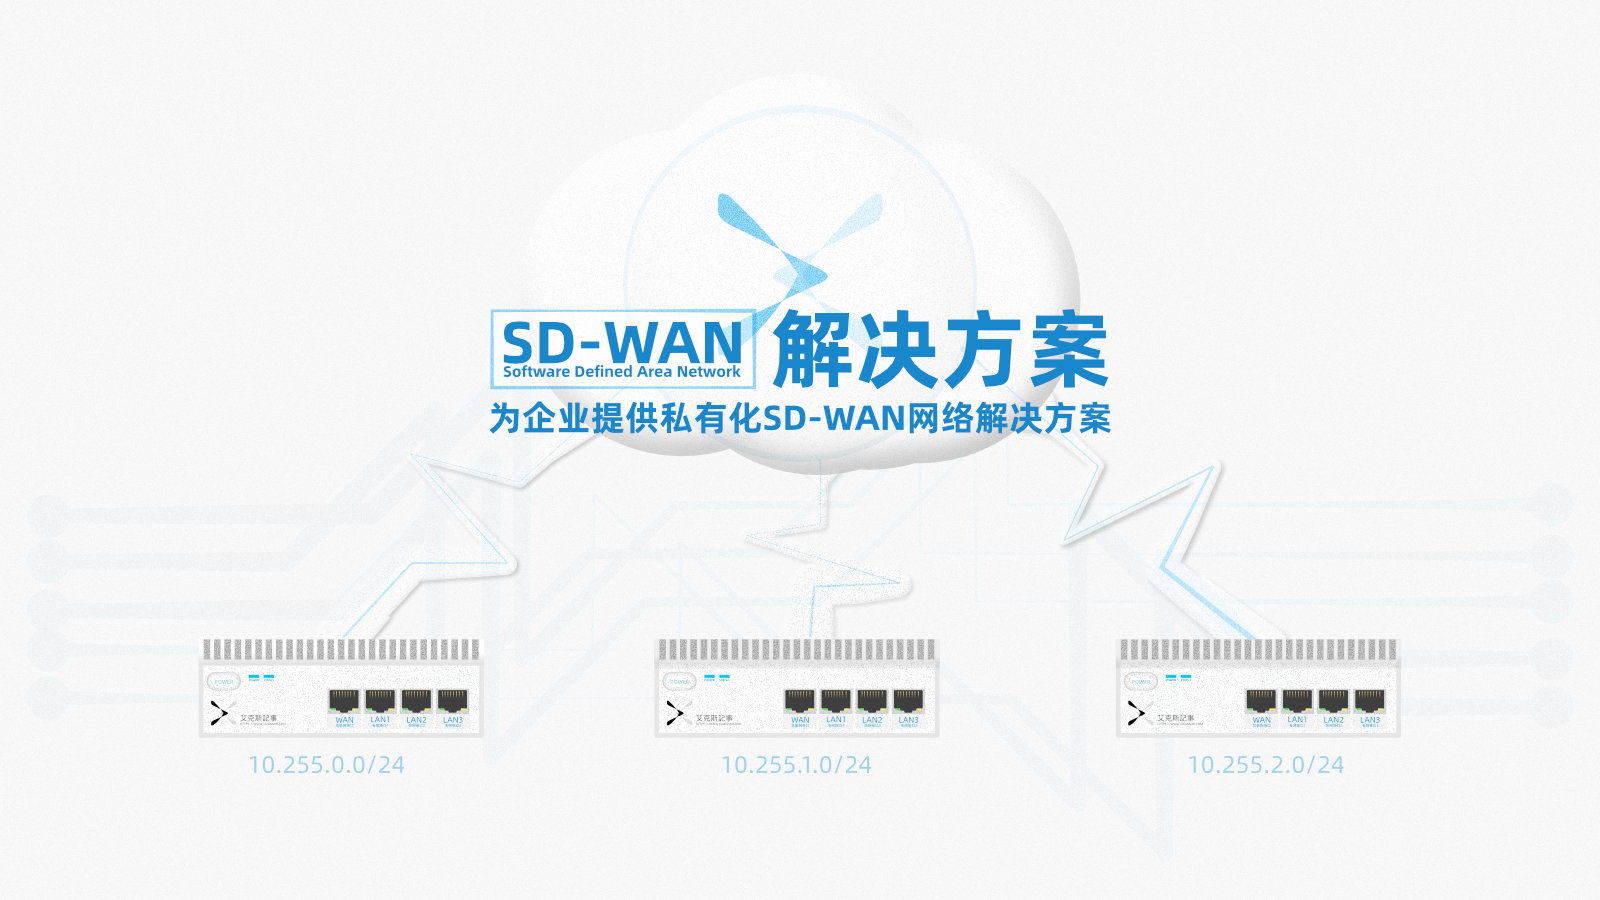 SD-WAN 解决方案,为企业提供私有化SD-WAN解决方案